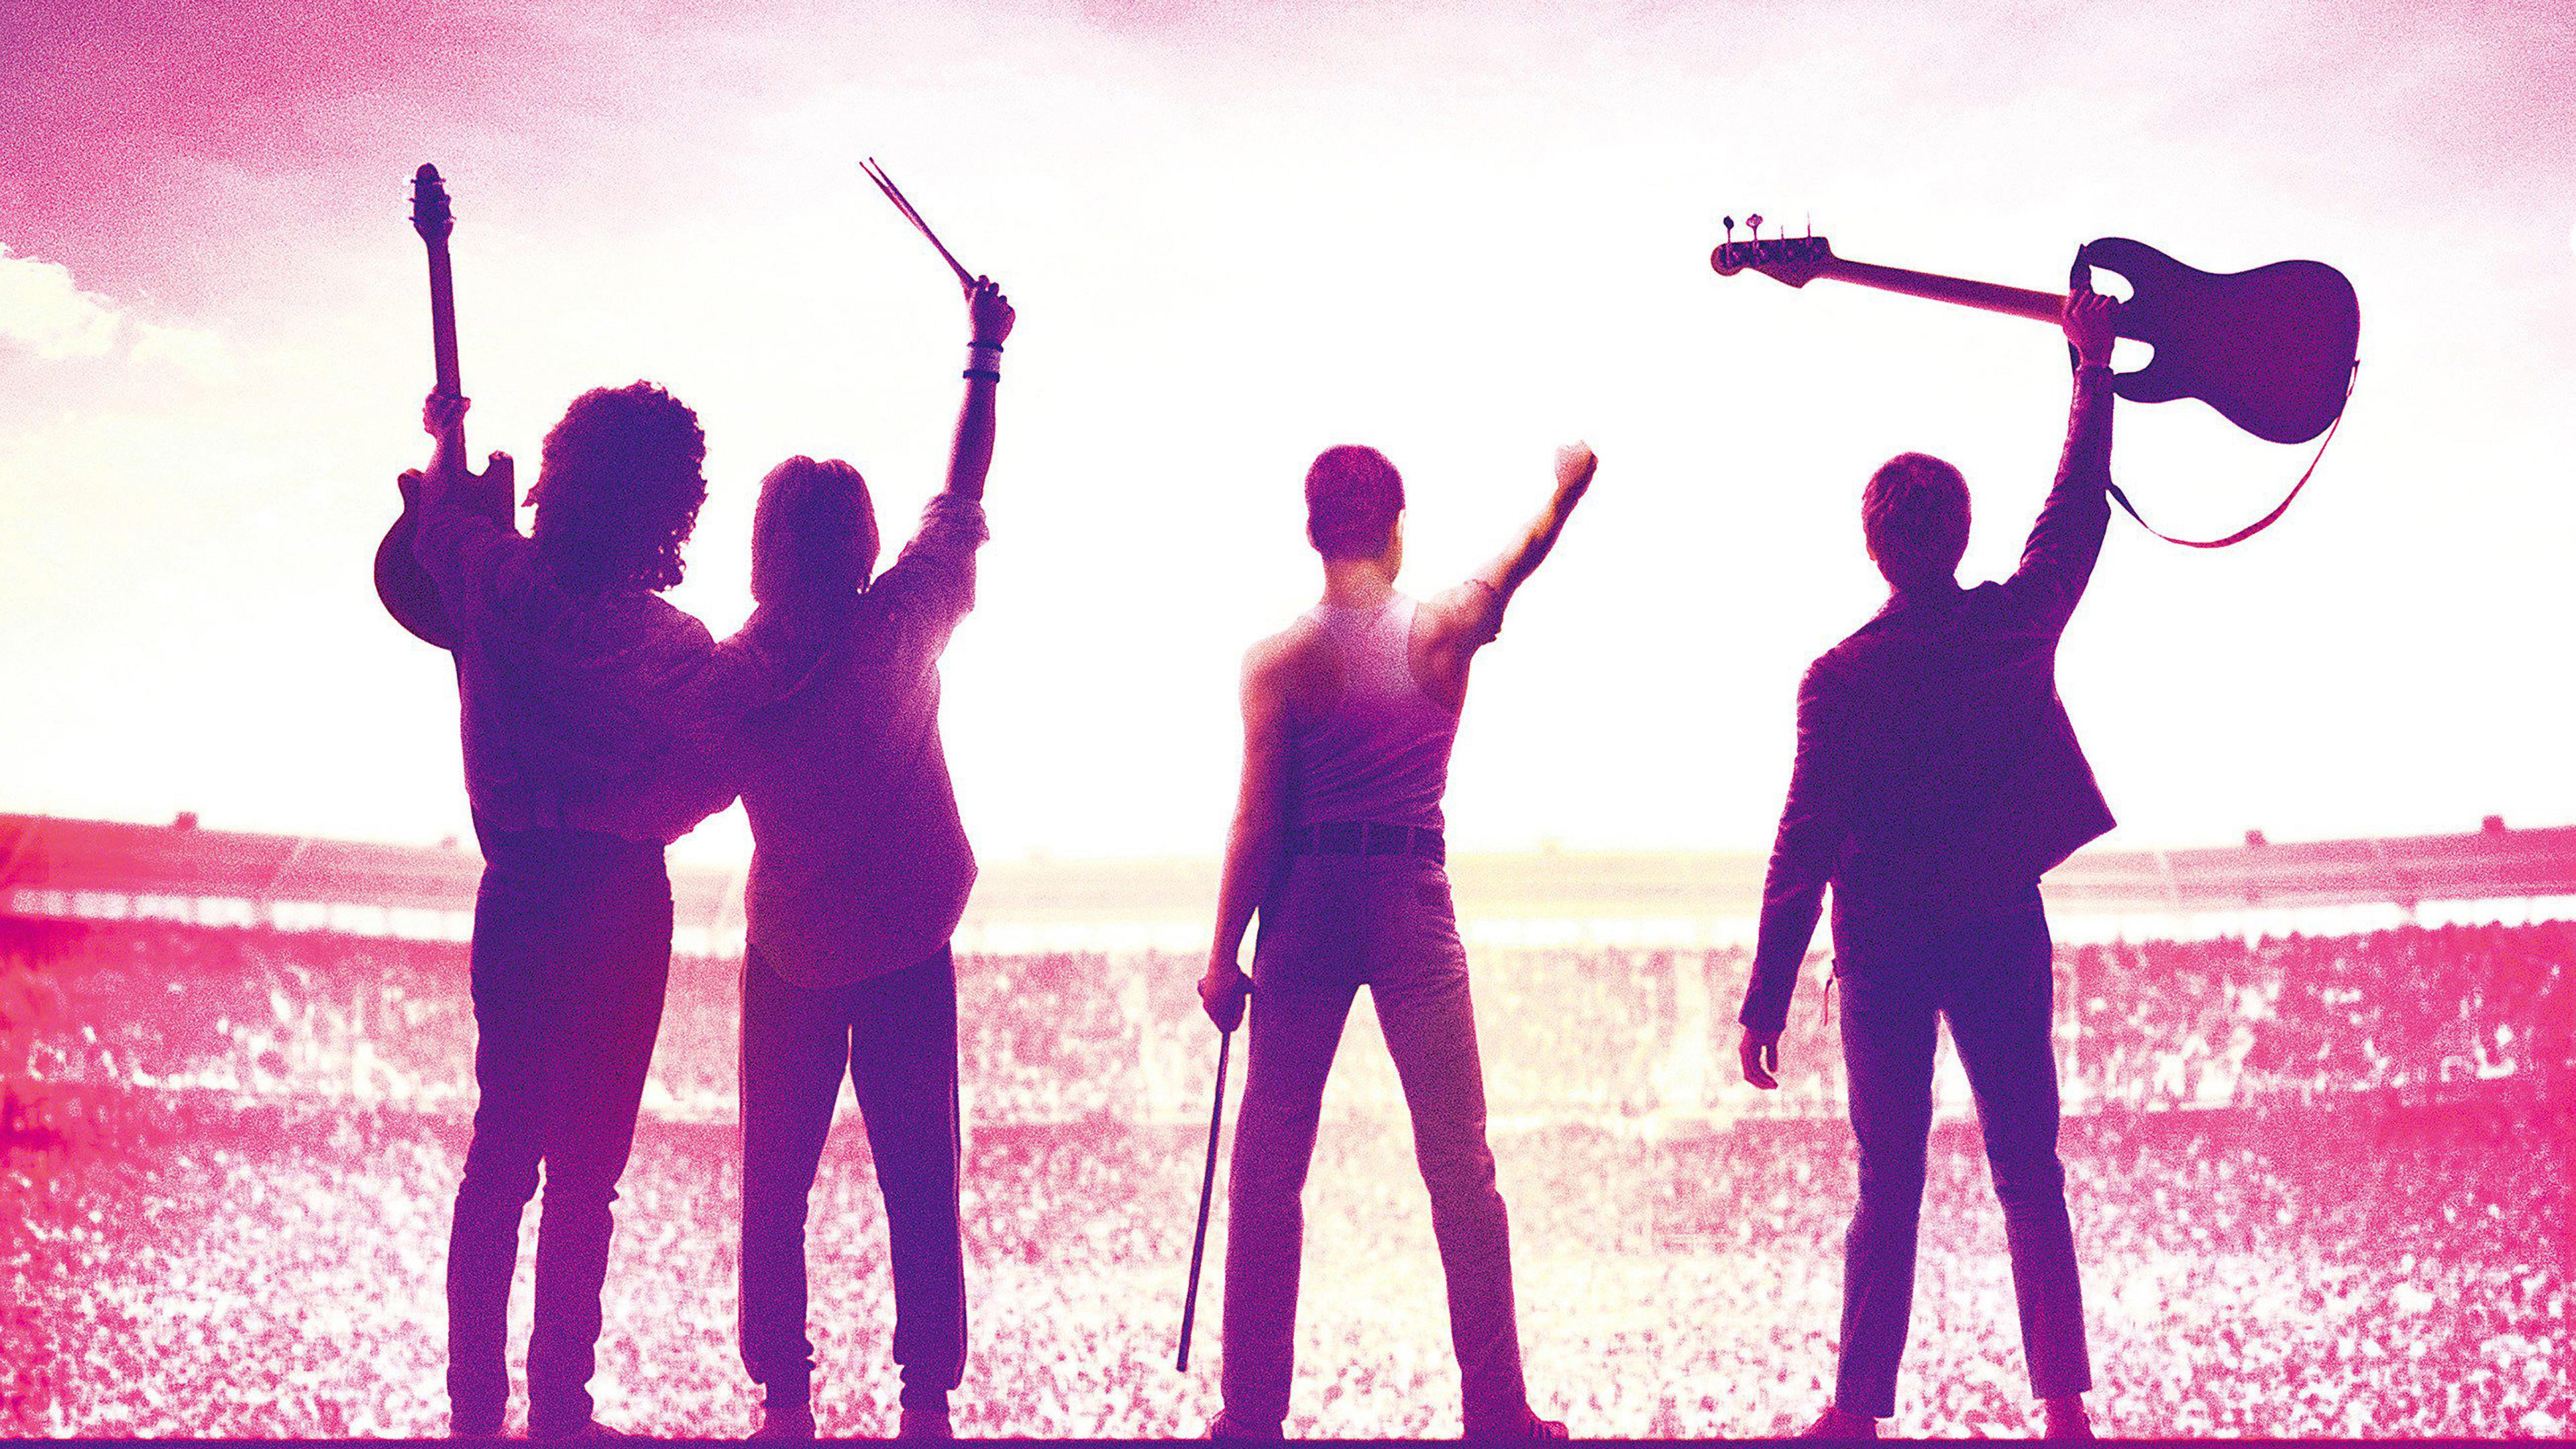 bohemian rhapsody 2018 movie 4k 1553073915 - Bohemian Rhapsody 2018 Movie 4k - movies wallpapers, hd-wallpapers, bohemian rhapsody wallpapers, 5k wallpapers, 4k-wallpapers, 2018-movies-wallpapers